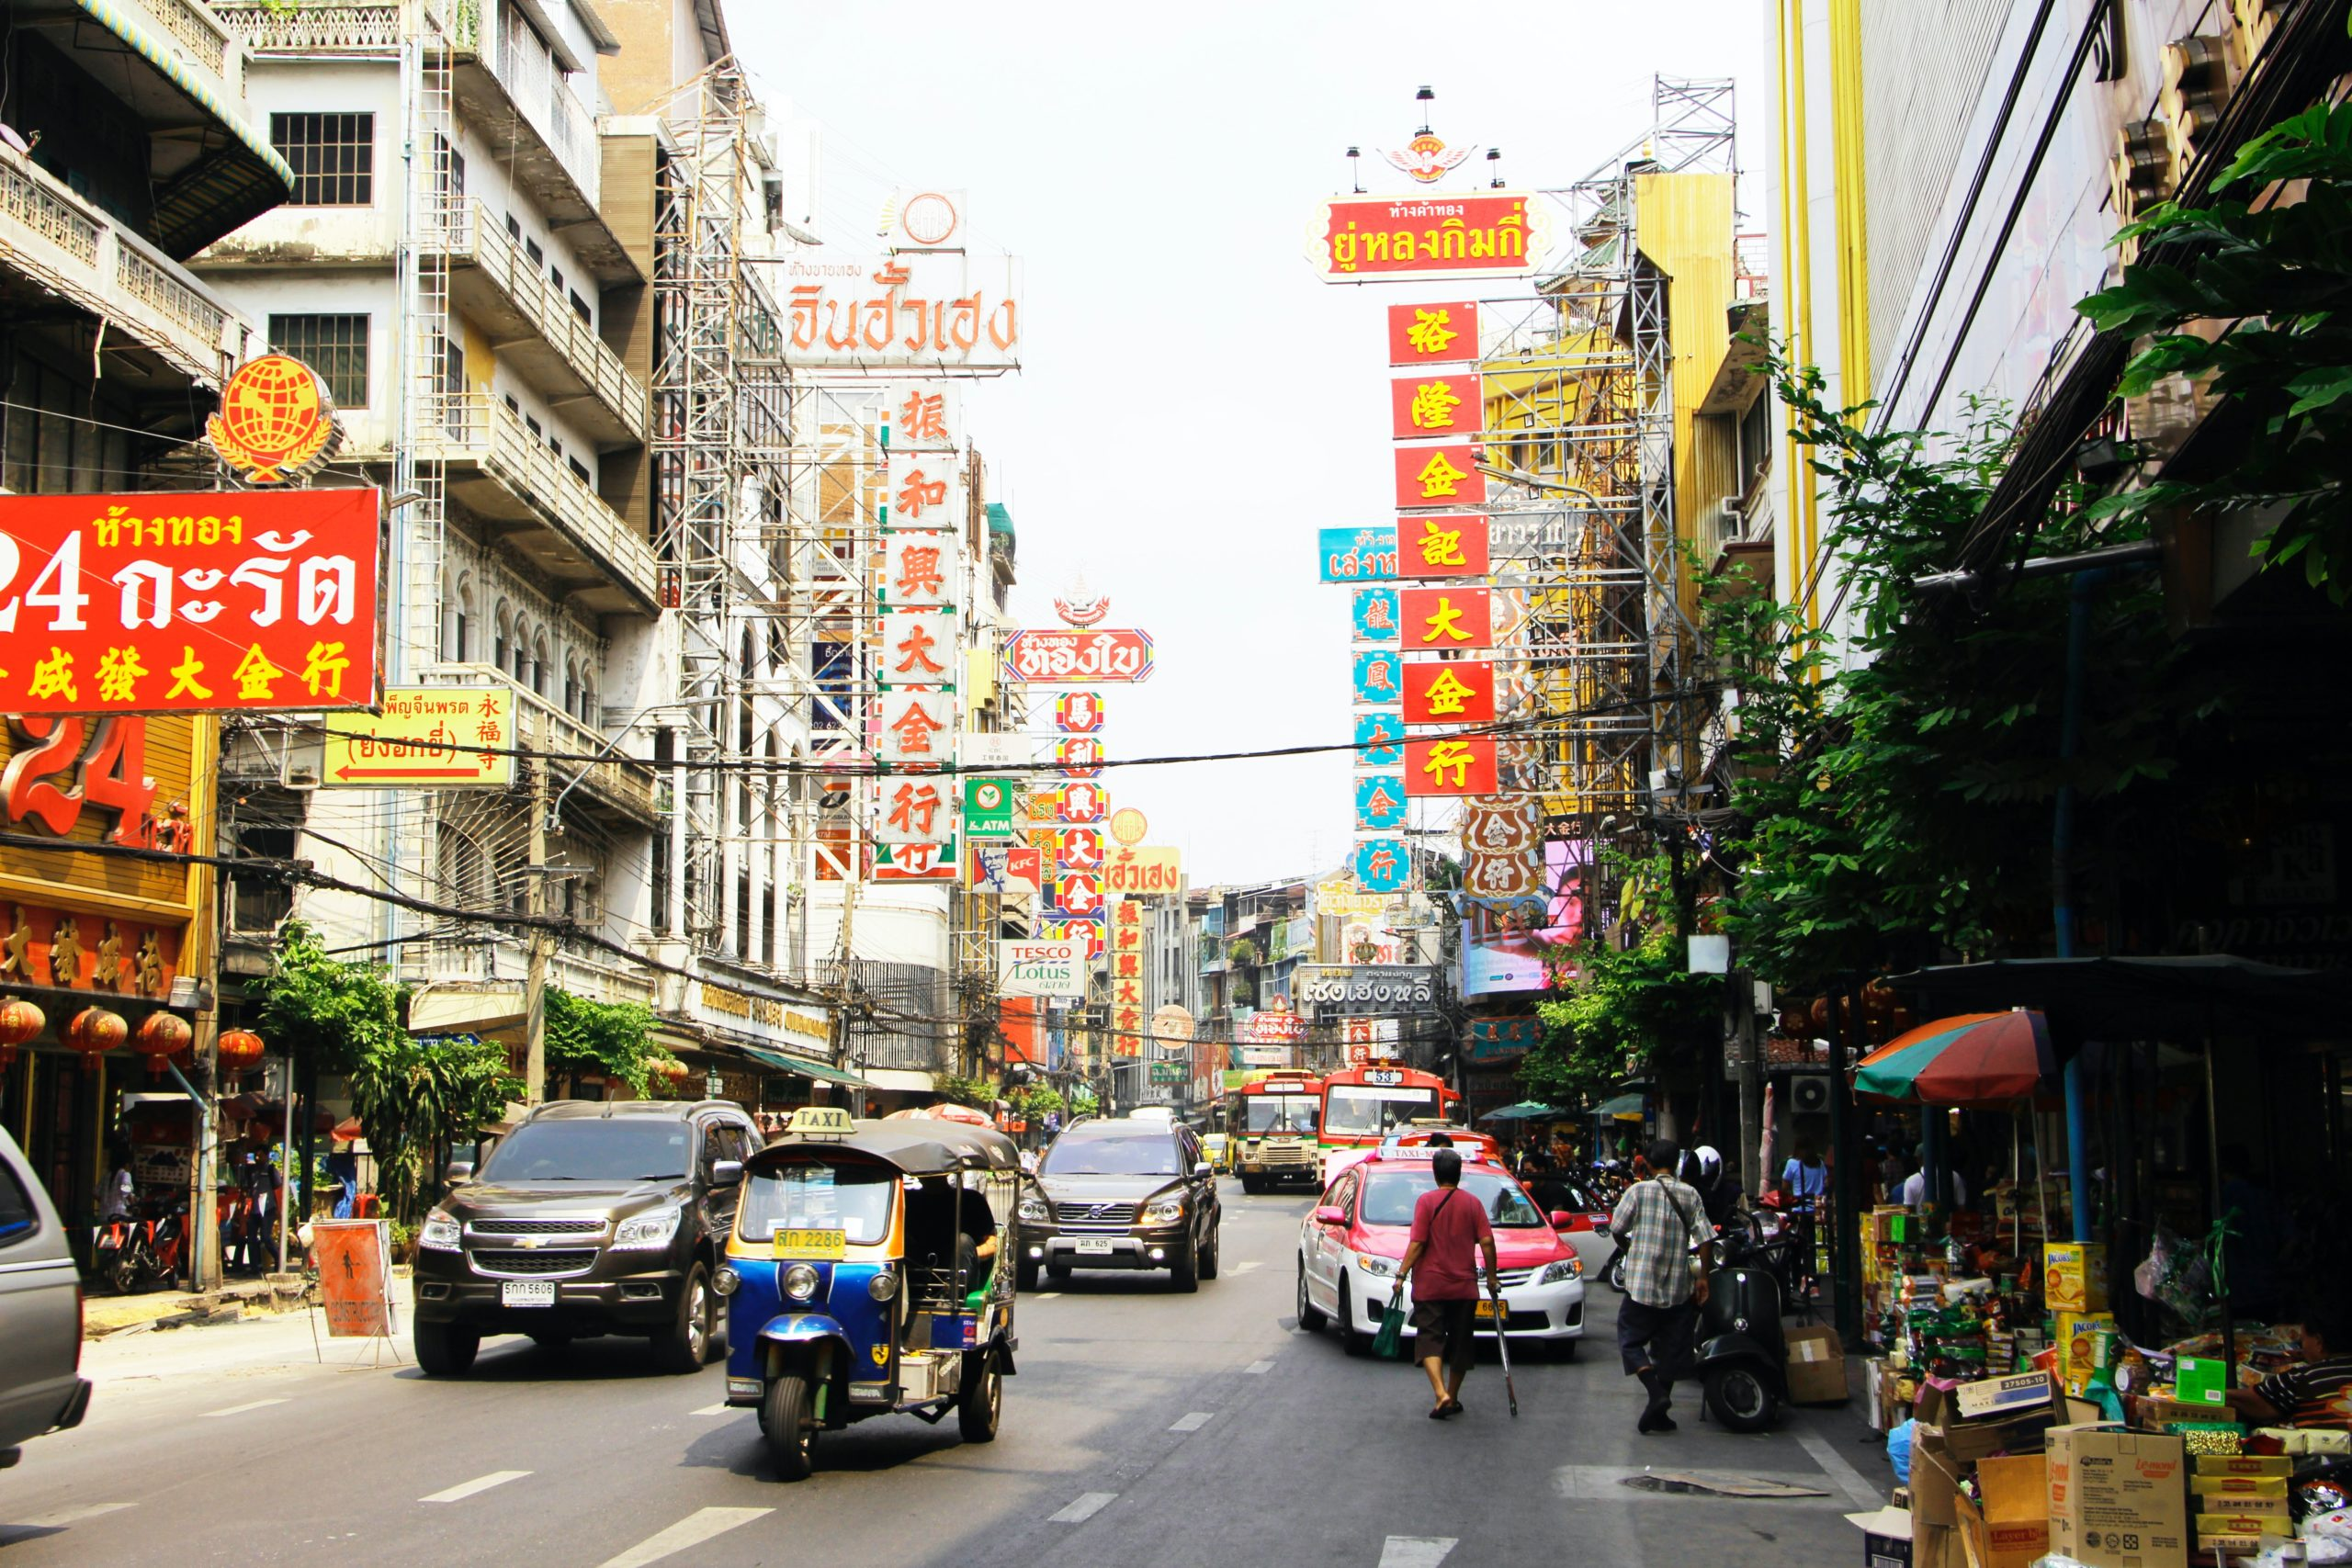 huge-colorful-market-india